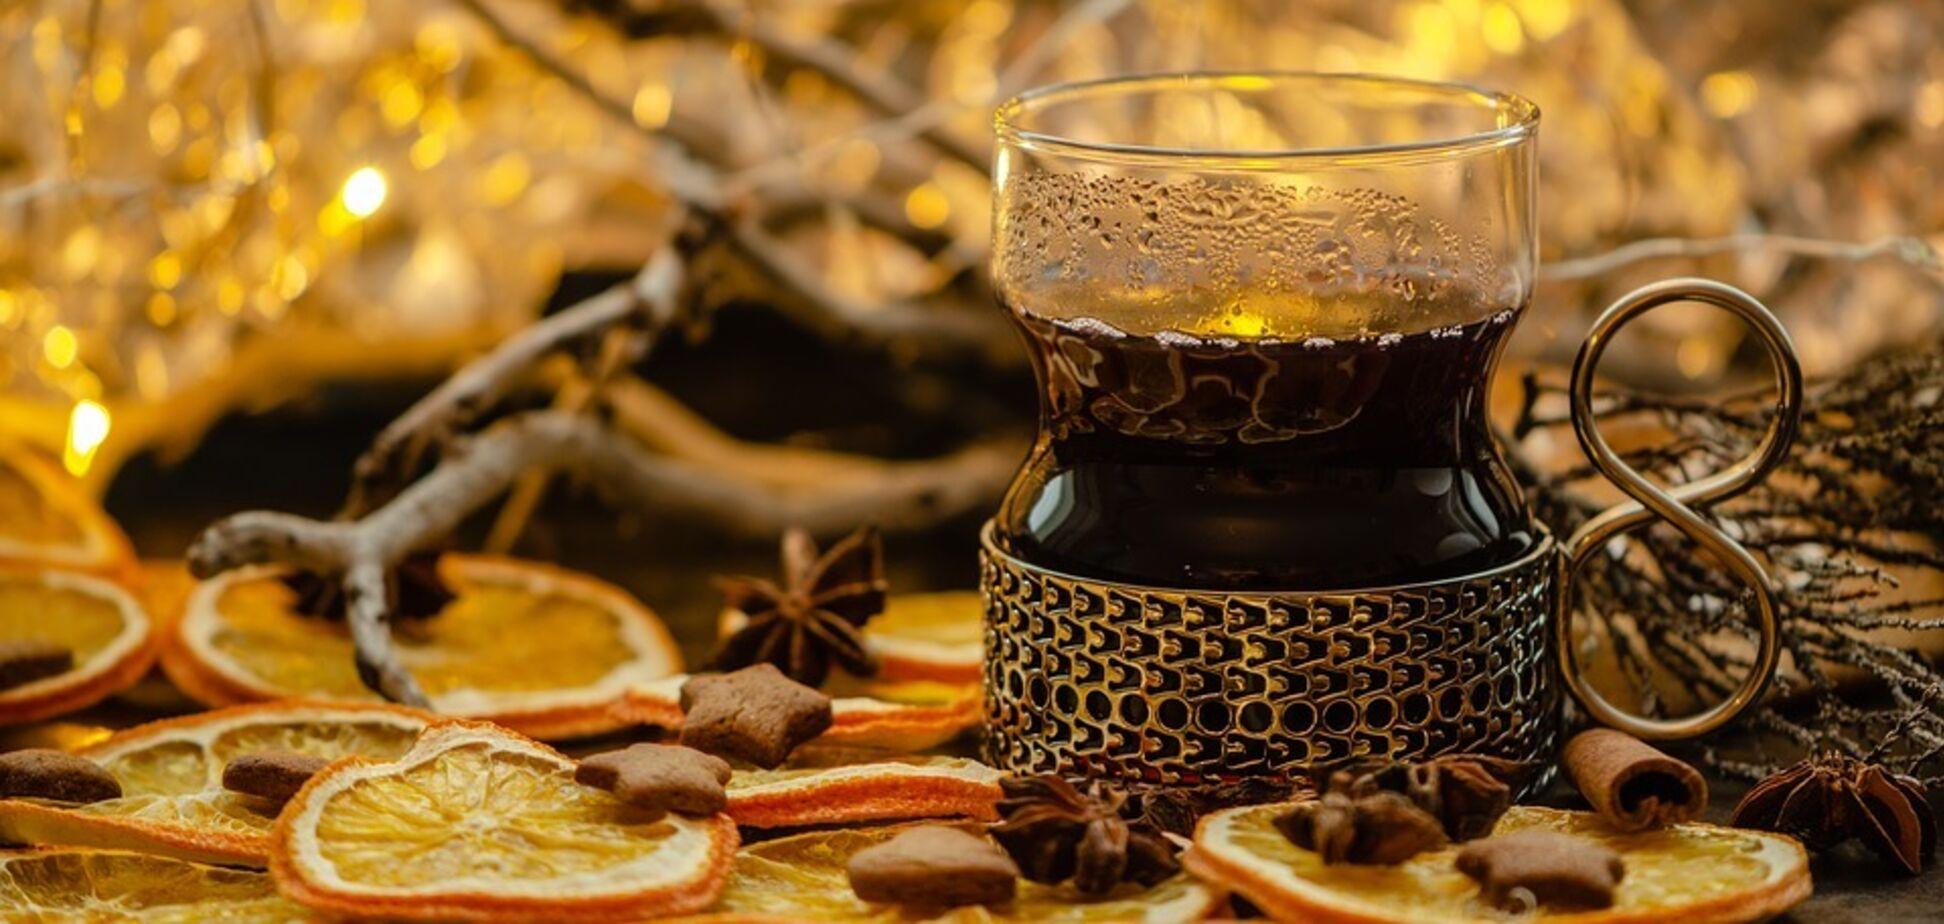 Глинтвейн в домашних условиях: 3 варианта пряного напитка